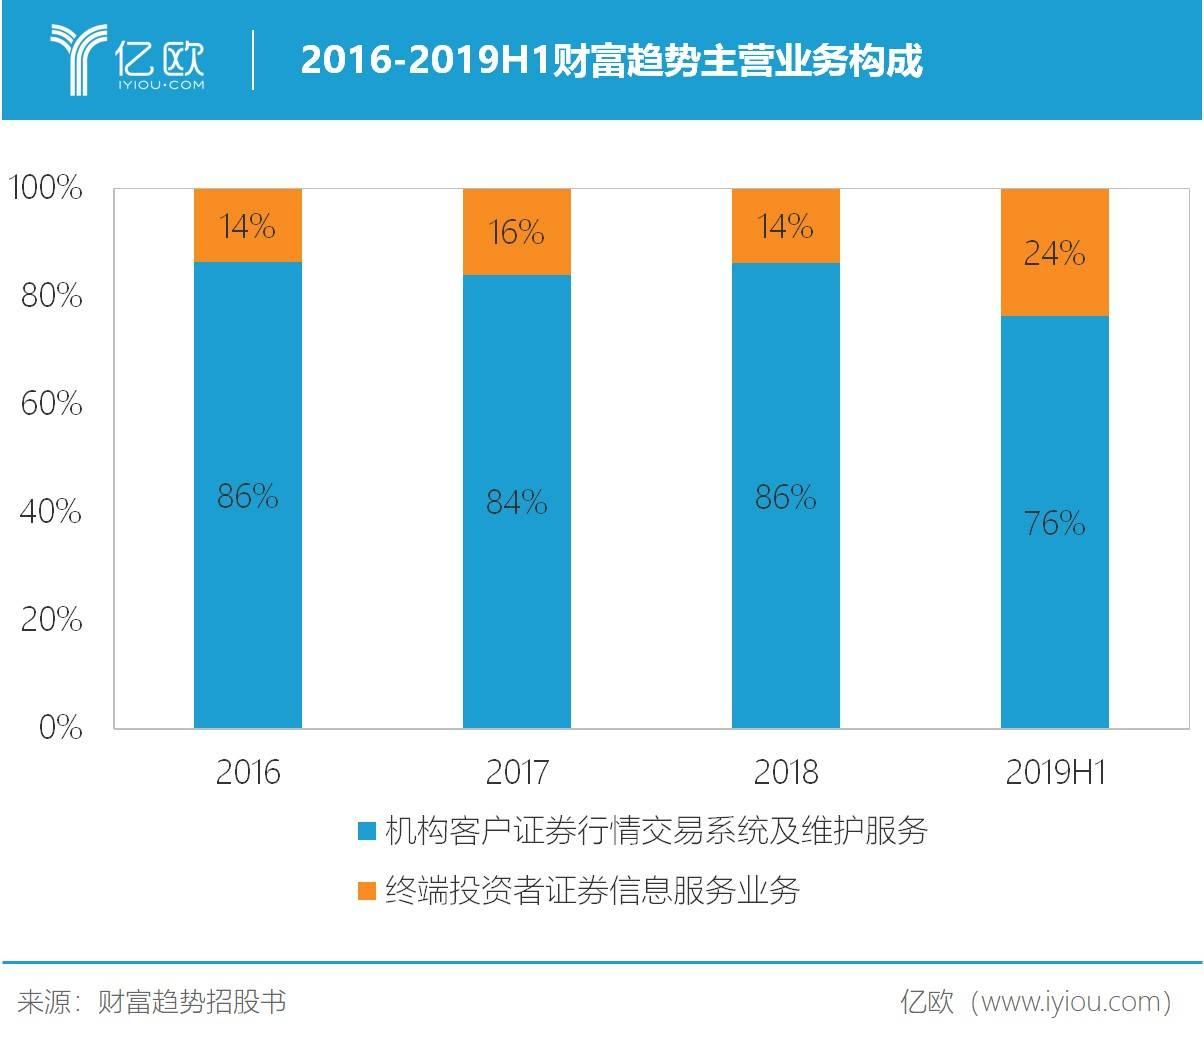 2016-2019H1财富趋势主营业务构成